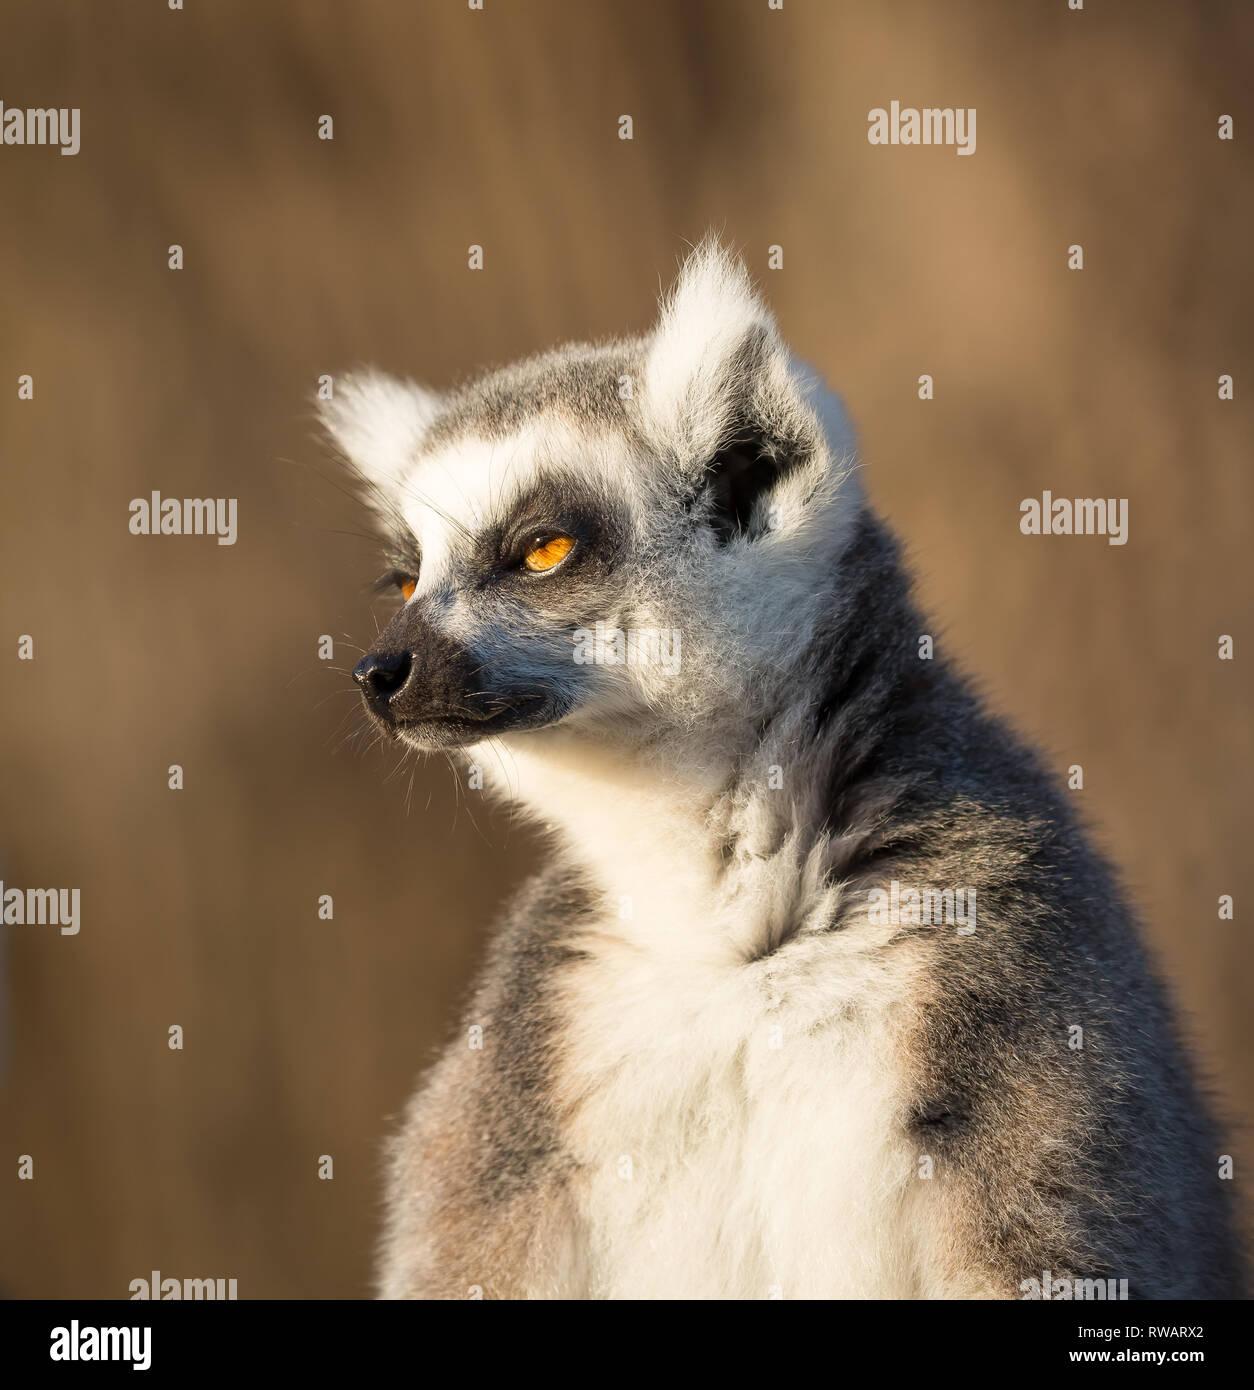 Detaillierte, portrait Nahaufnahme von einem Ring-tailed Lemur (Lemur catta). Stockbild